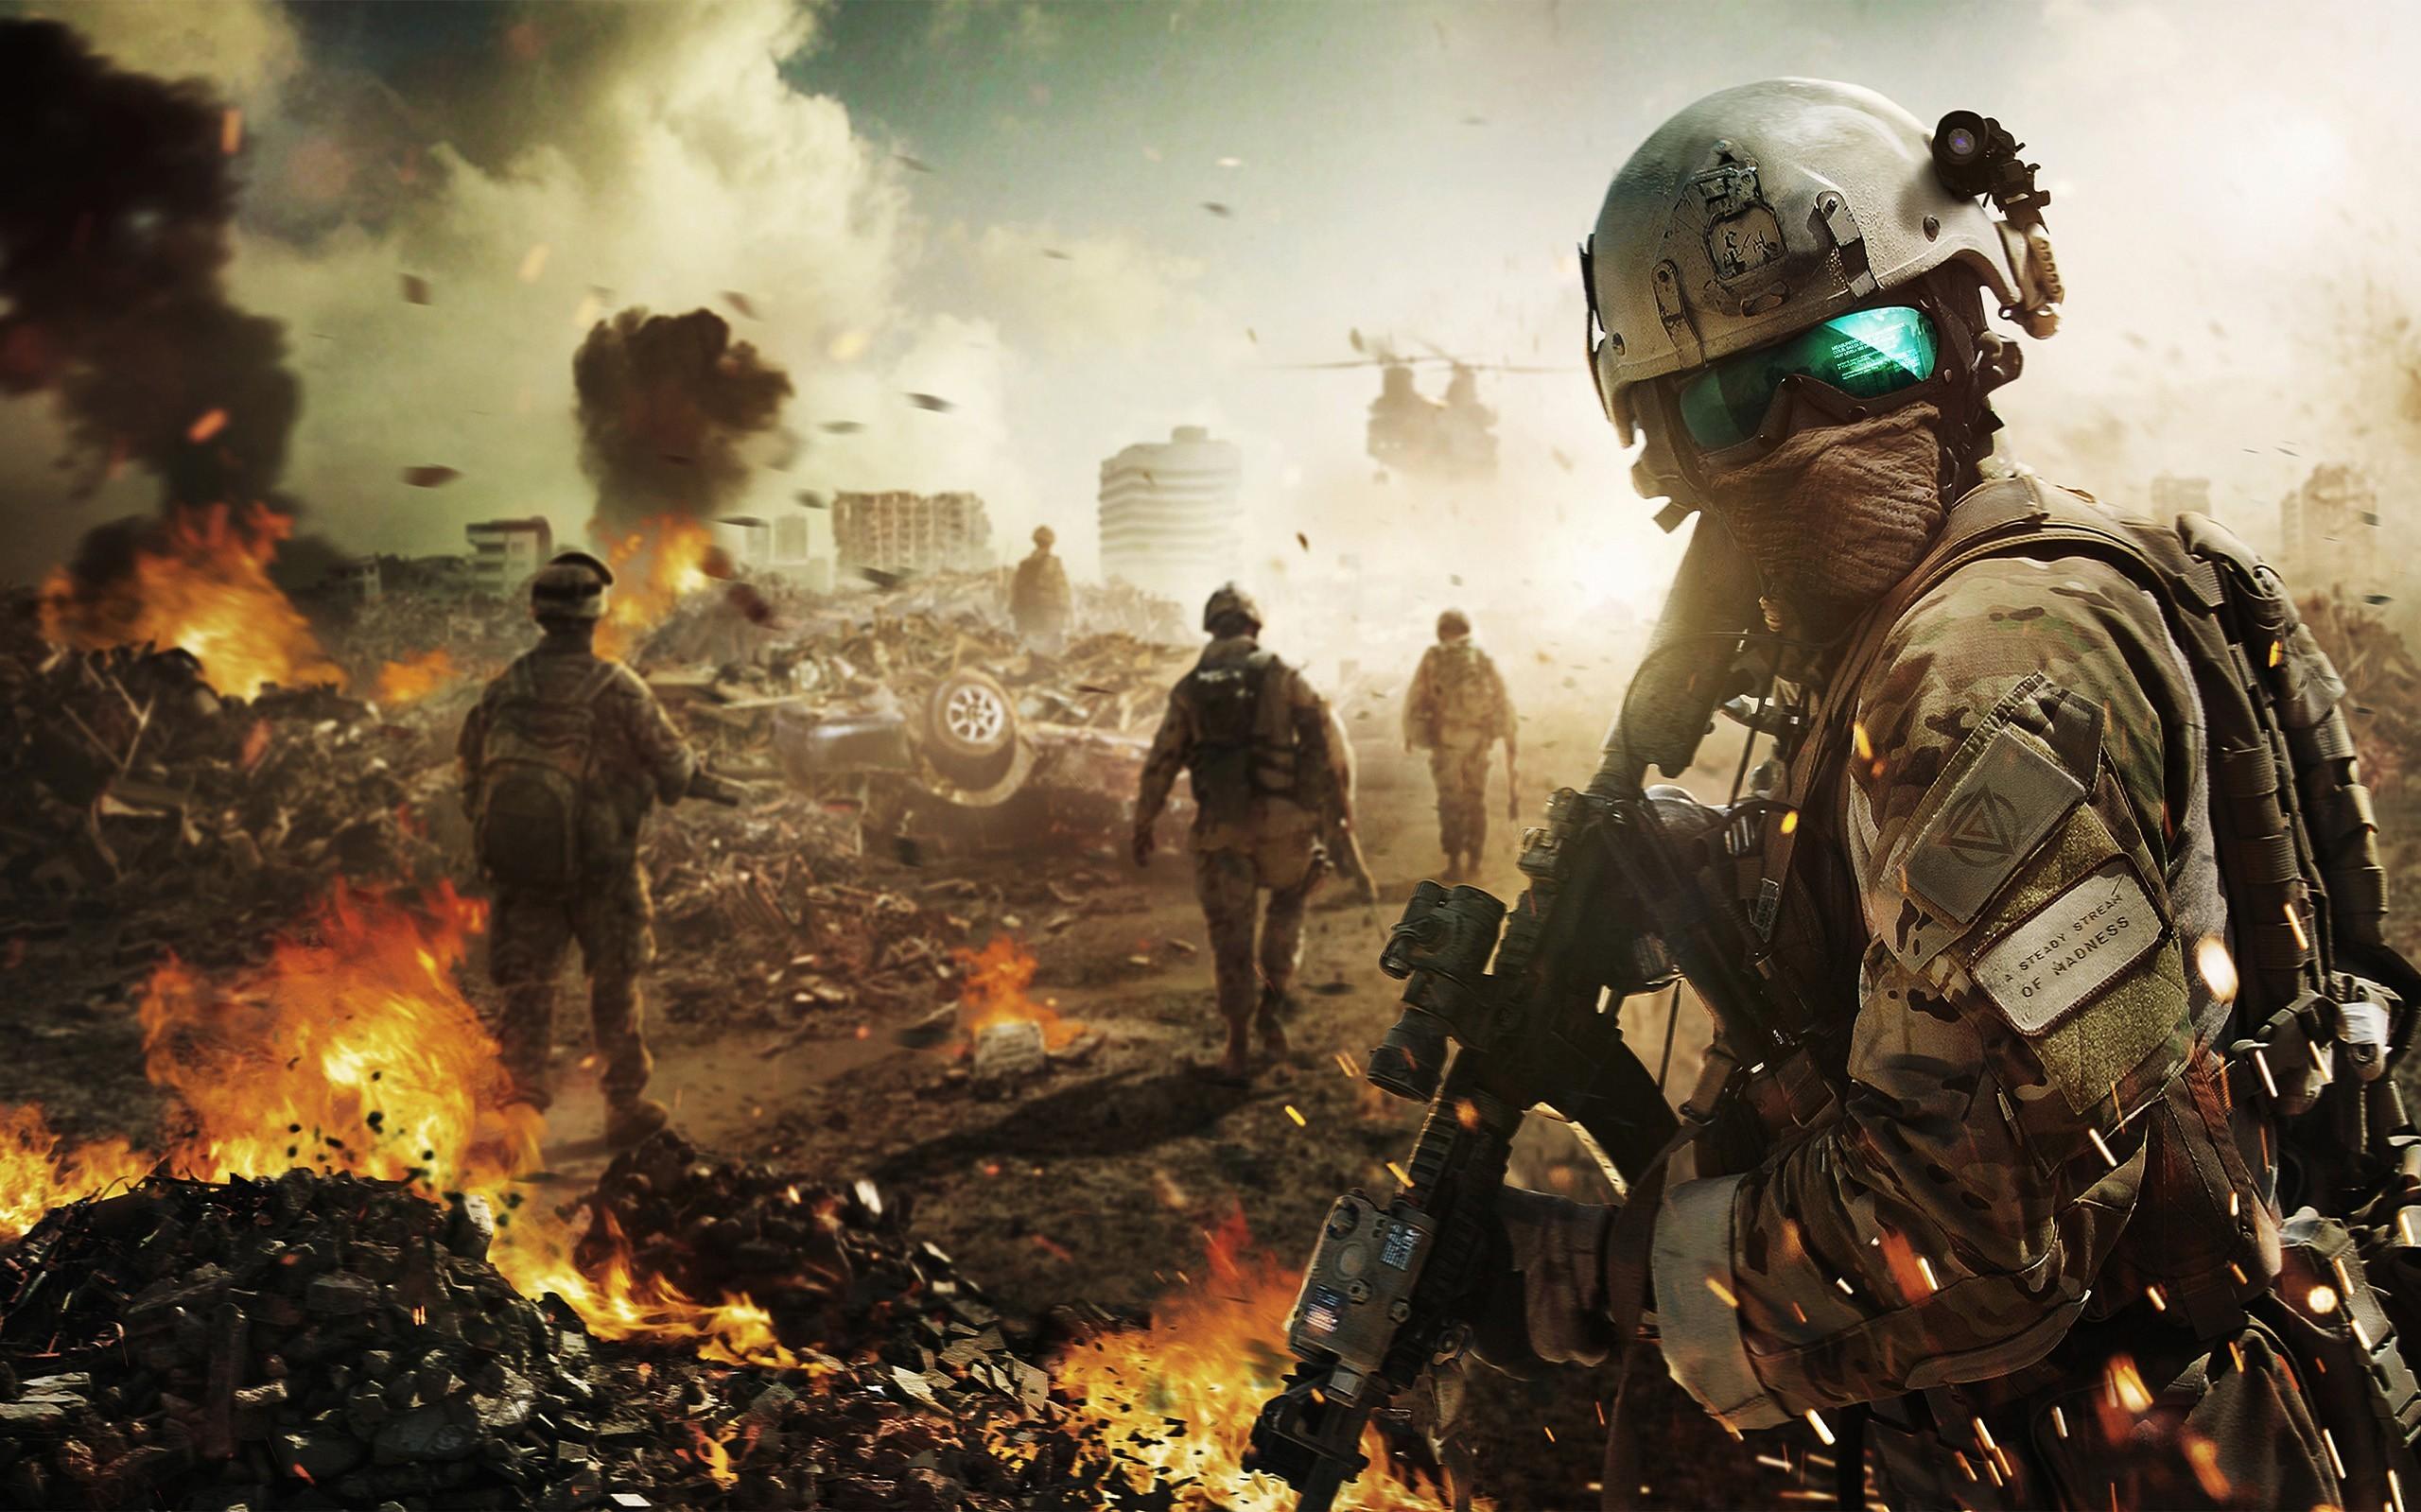 Ghost Recon, Future Soldier, Tom Clancy's, солдаты обои скачать